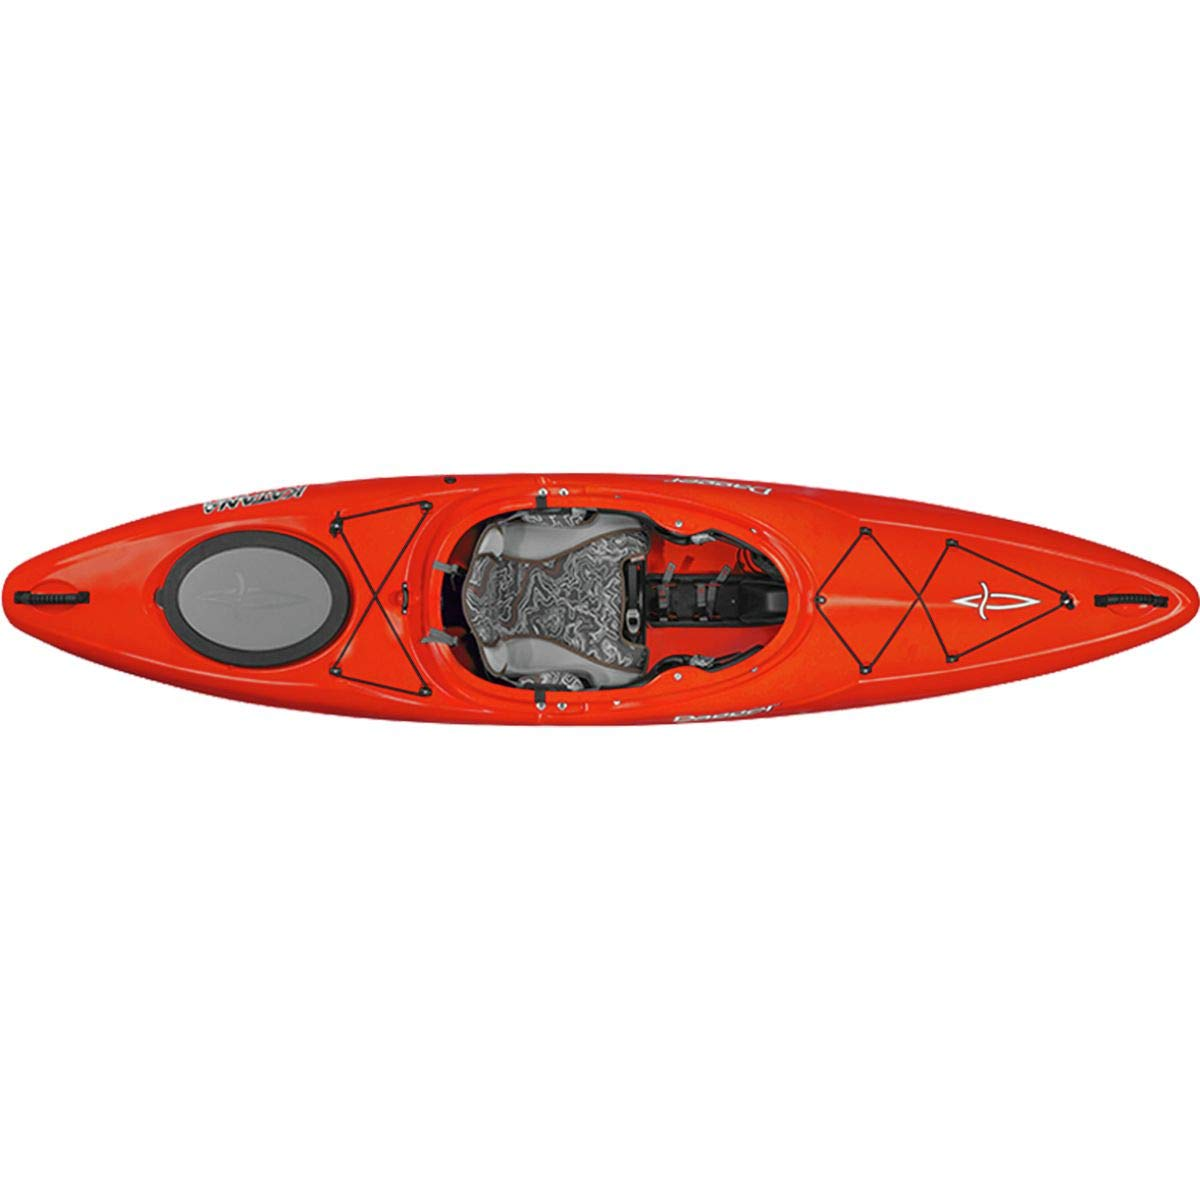 Dagger Katana Crossover Whitewater Kayak - 9.7, Red by Dagger